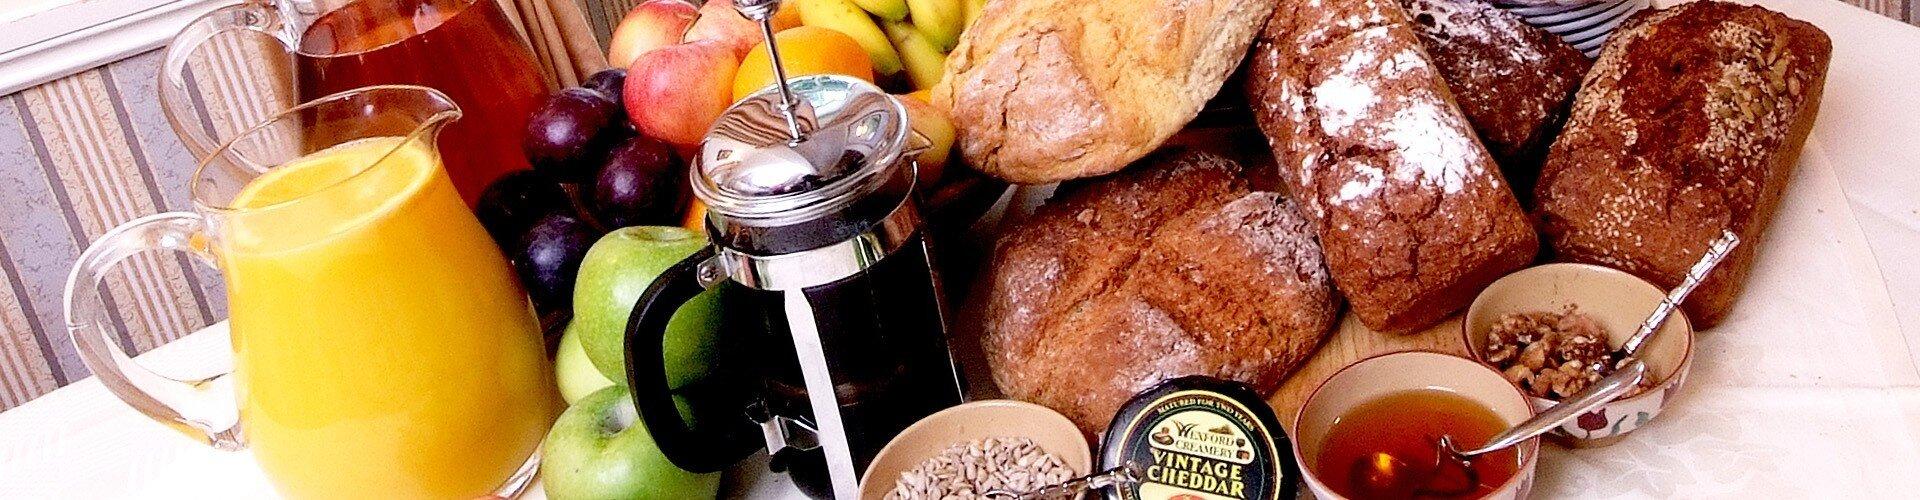 Farm Fresh Ingredients Home Baking